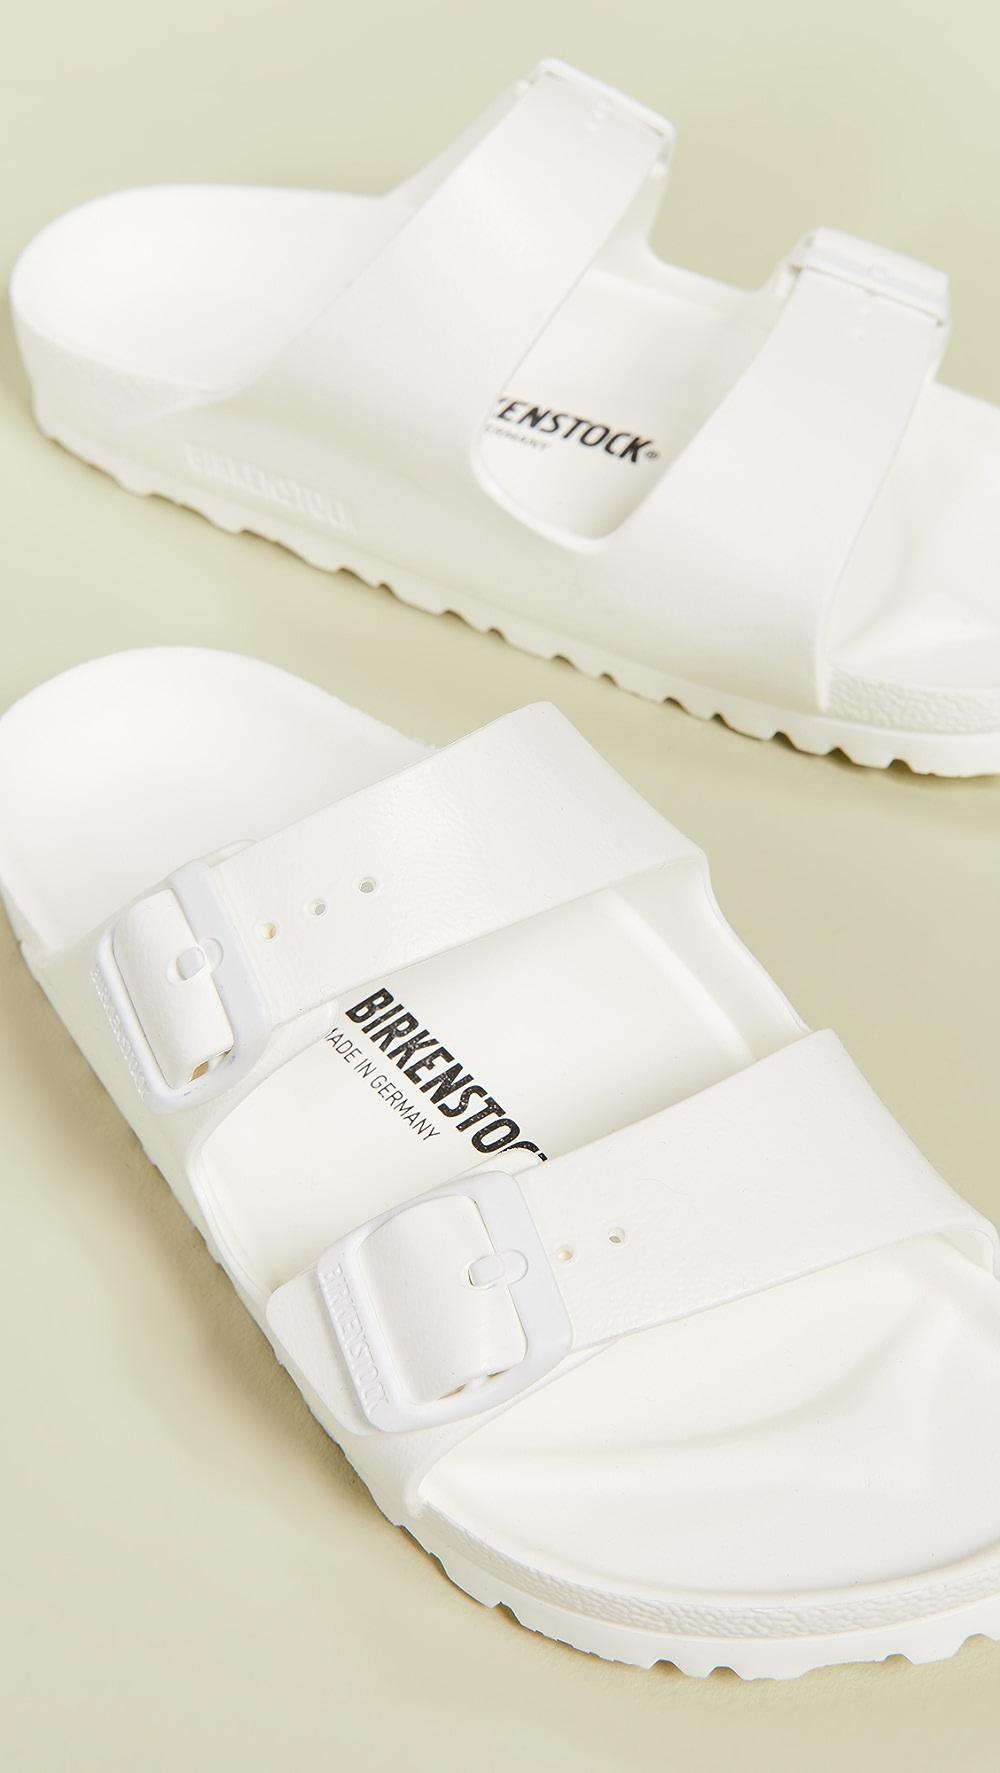 Cheap Price Birkenstock - Arizona Sandals - Narrow Buy One Give One